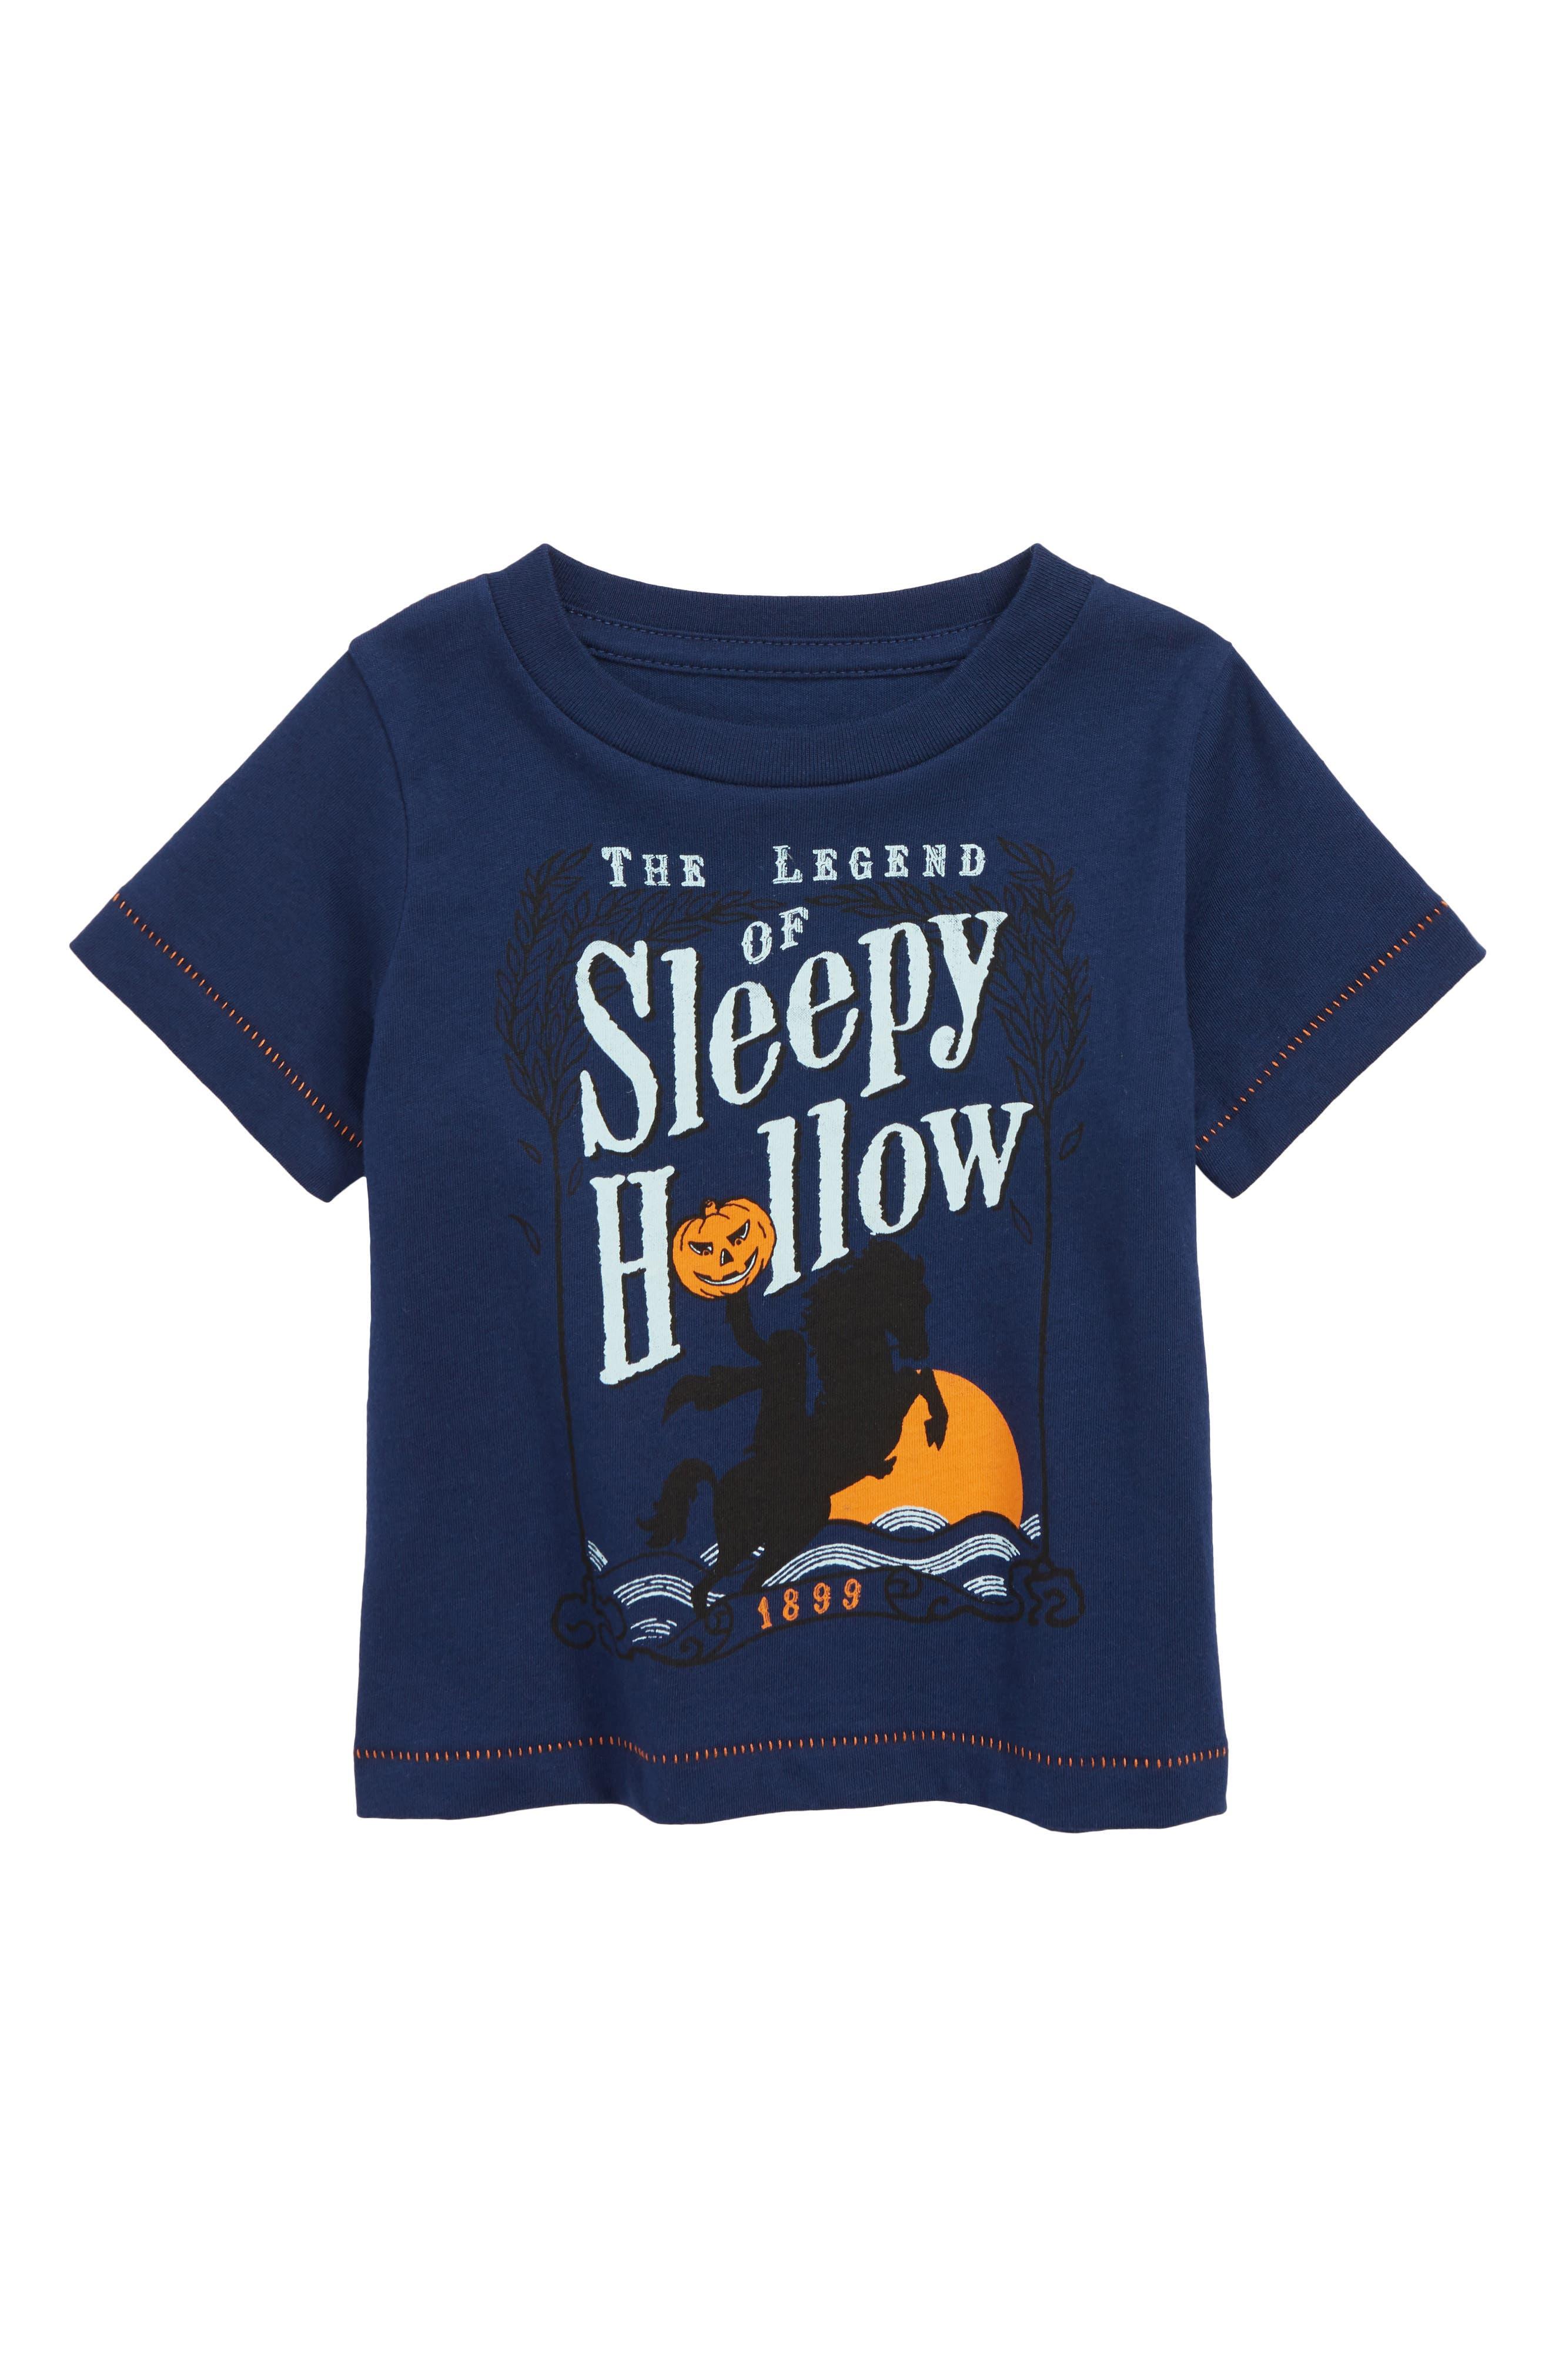 Peek Sleepy Hollow Graphic T-Shirt,                             Main thumbnail 1, color,                             NAVY